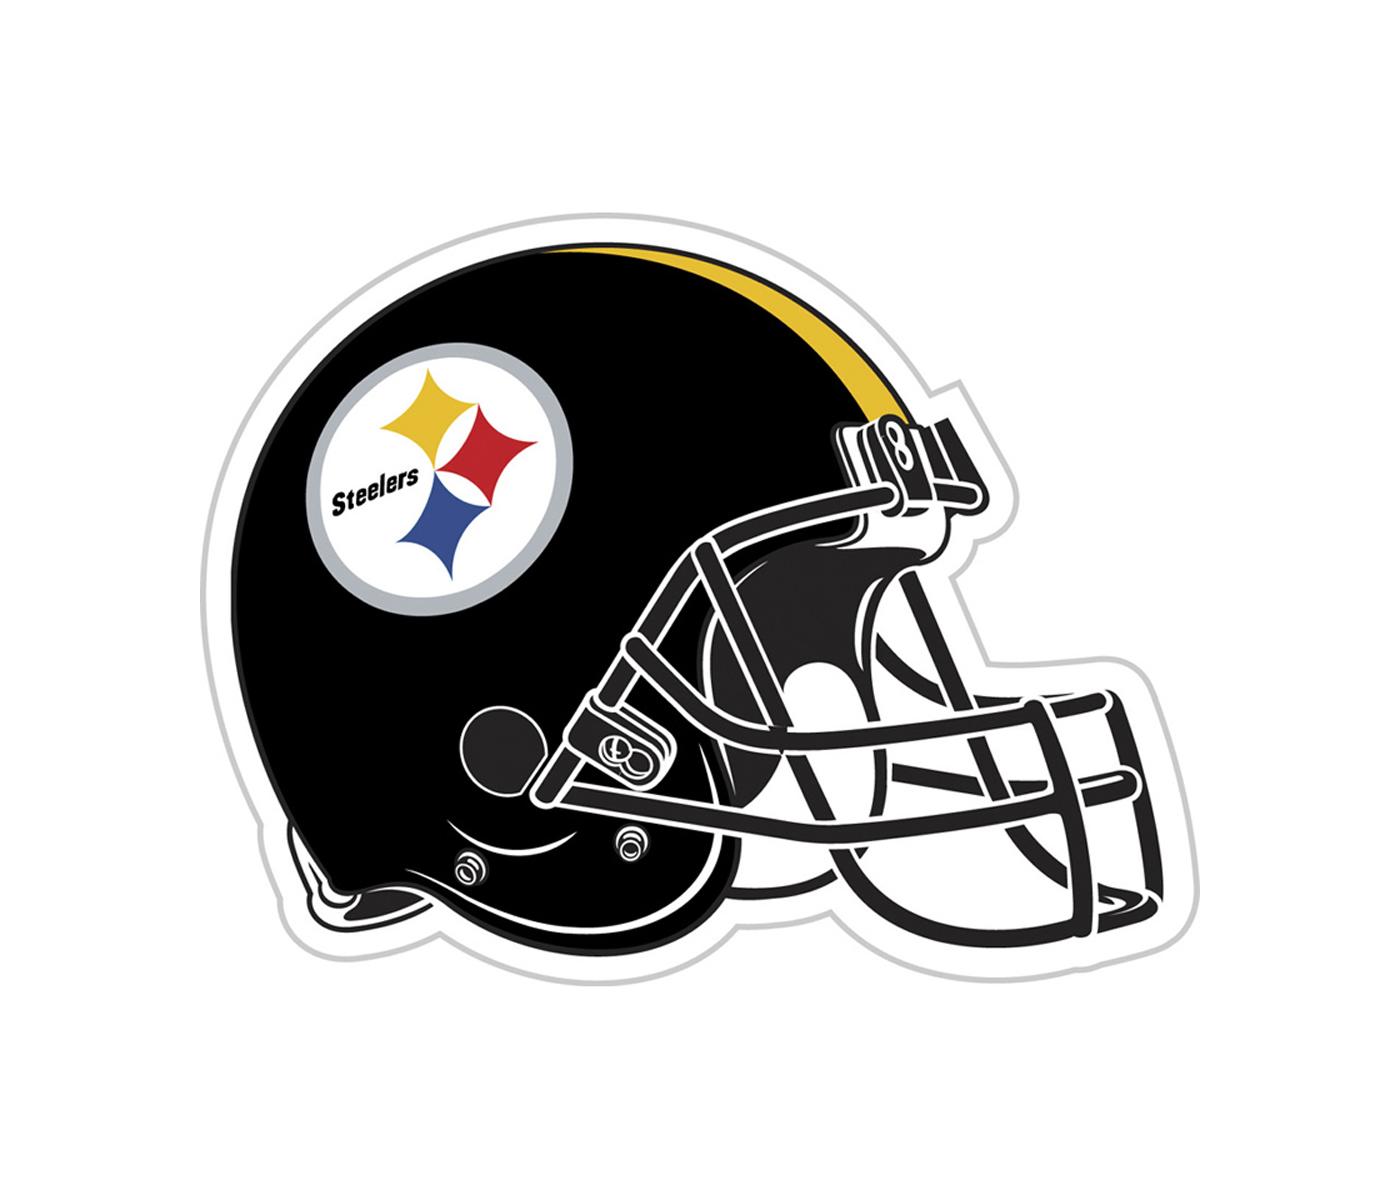 Pittsburgh Steelers Logo Png Transparent Svg Vector Freebie Supply Pittsburgh Steelers Logo Steelers Helmet Pittsburgh Steelers Helmet